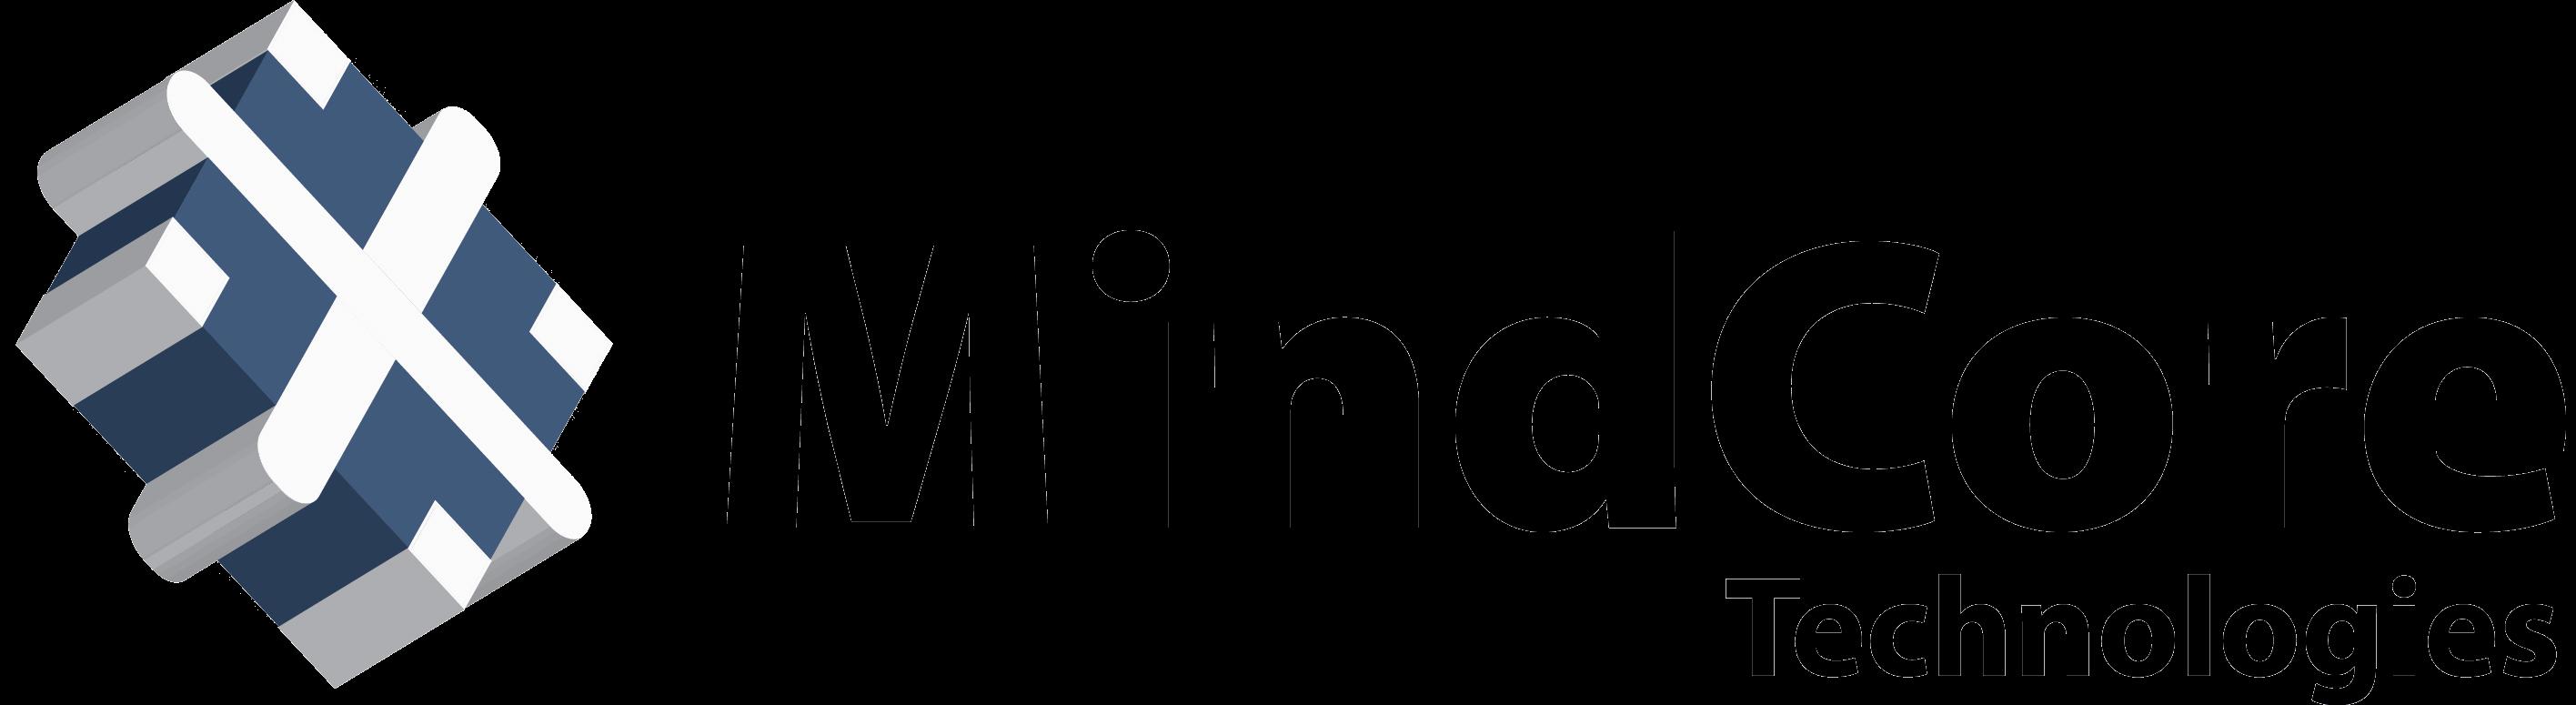 Technologies MINDCORE Technologies